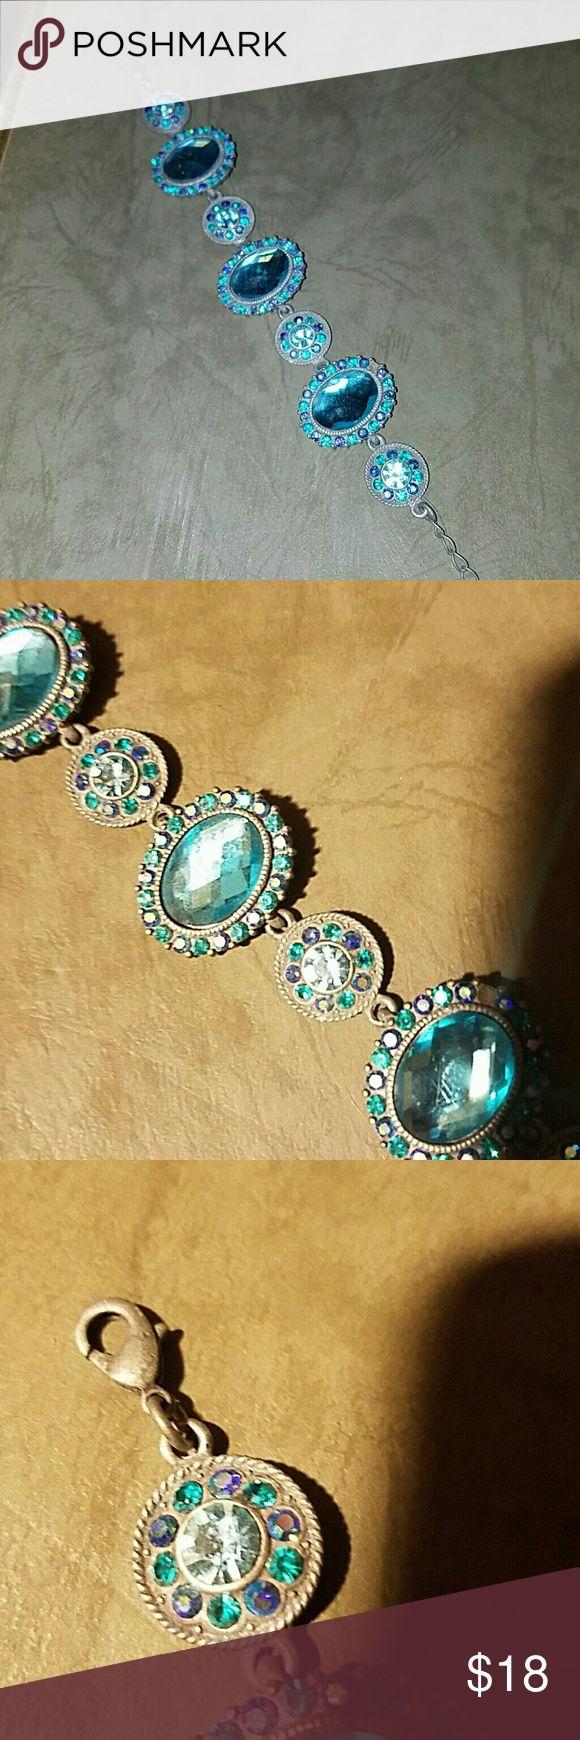 Tunisian Aqua , purple & green bracelet. A STUNNER Tunisian Aqua , purple & green bracelet. A STUNNER. Lobster claw closure, picture 3. Jewelry Bracelets